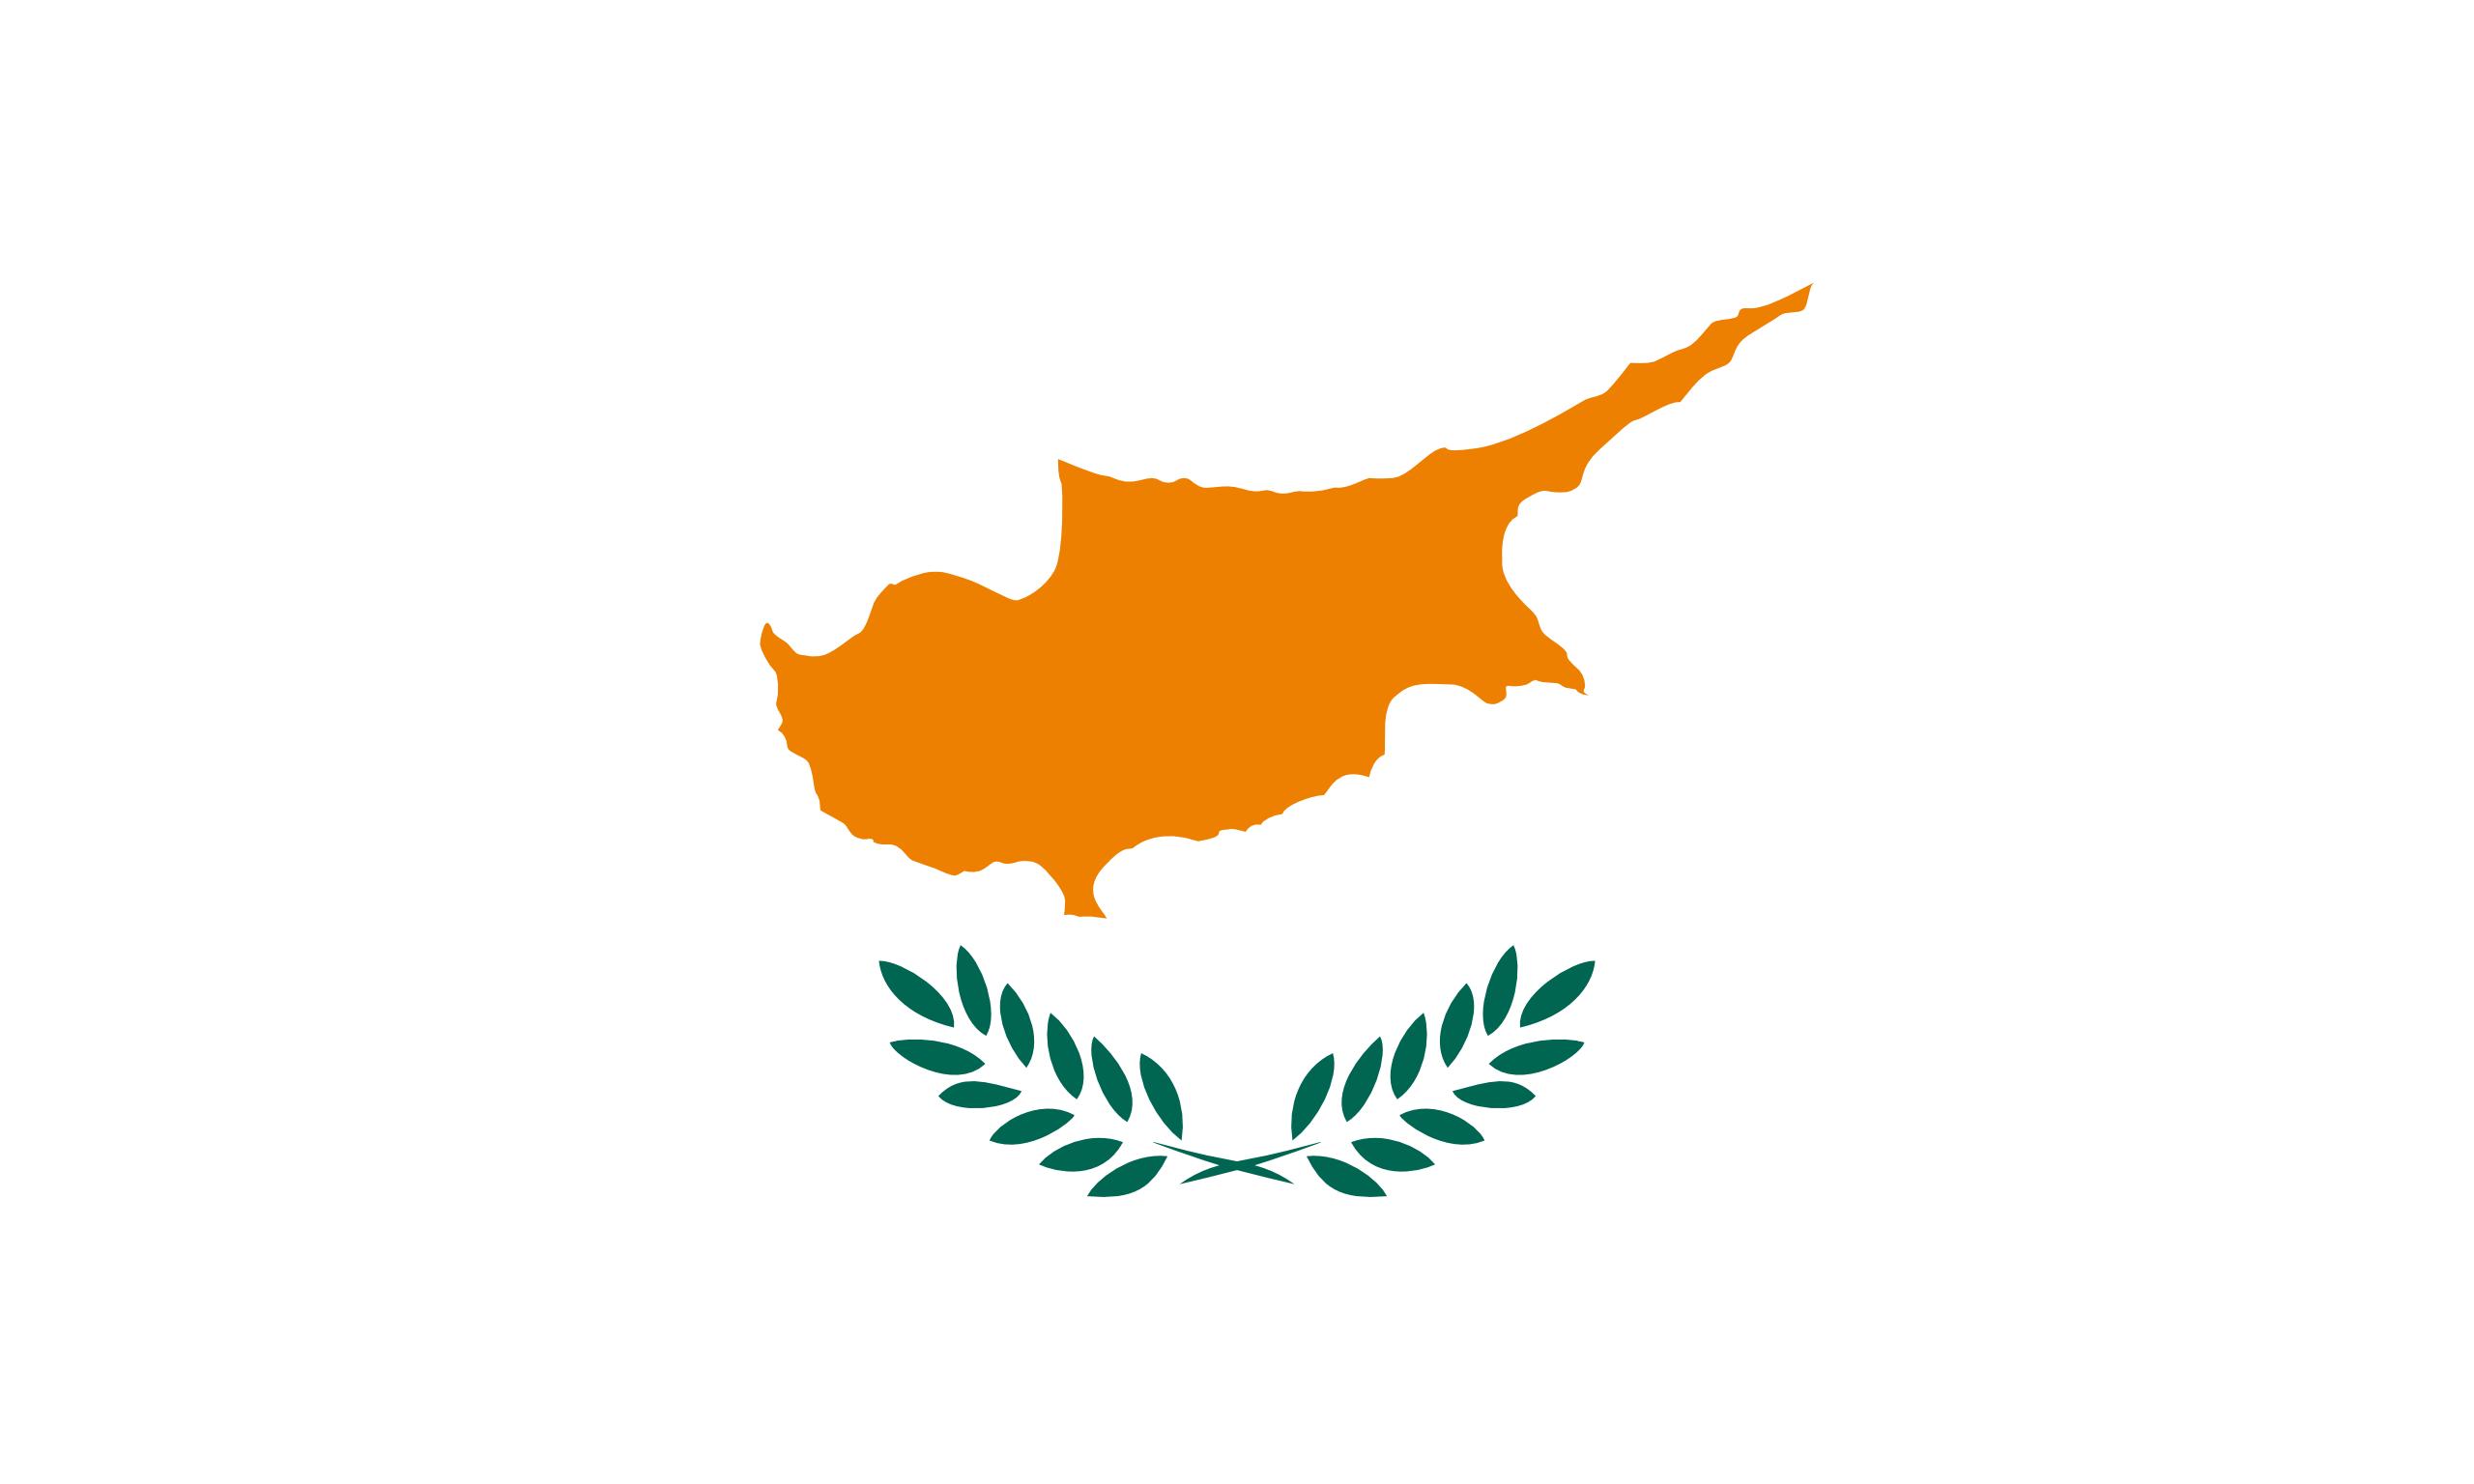 chipre, país, emblema, insignia, символ - Обои HD - Профессор falken.com